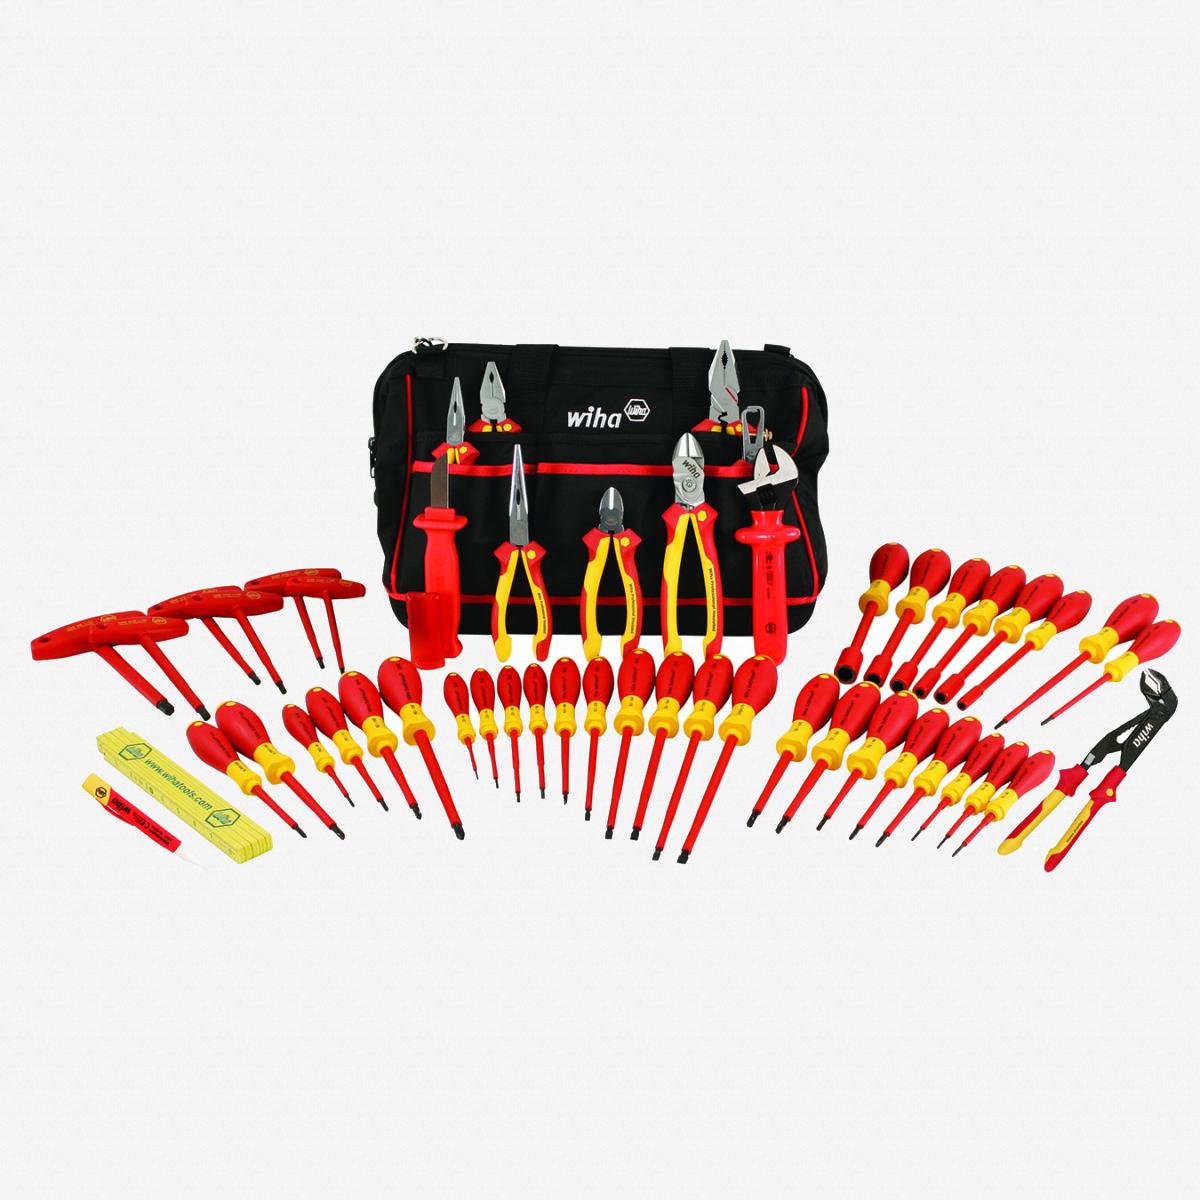 Wiha 32874 50 Piece Insulated Pliers and Screwdriver Tool Box - KC Tool